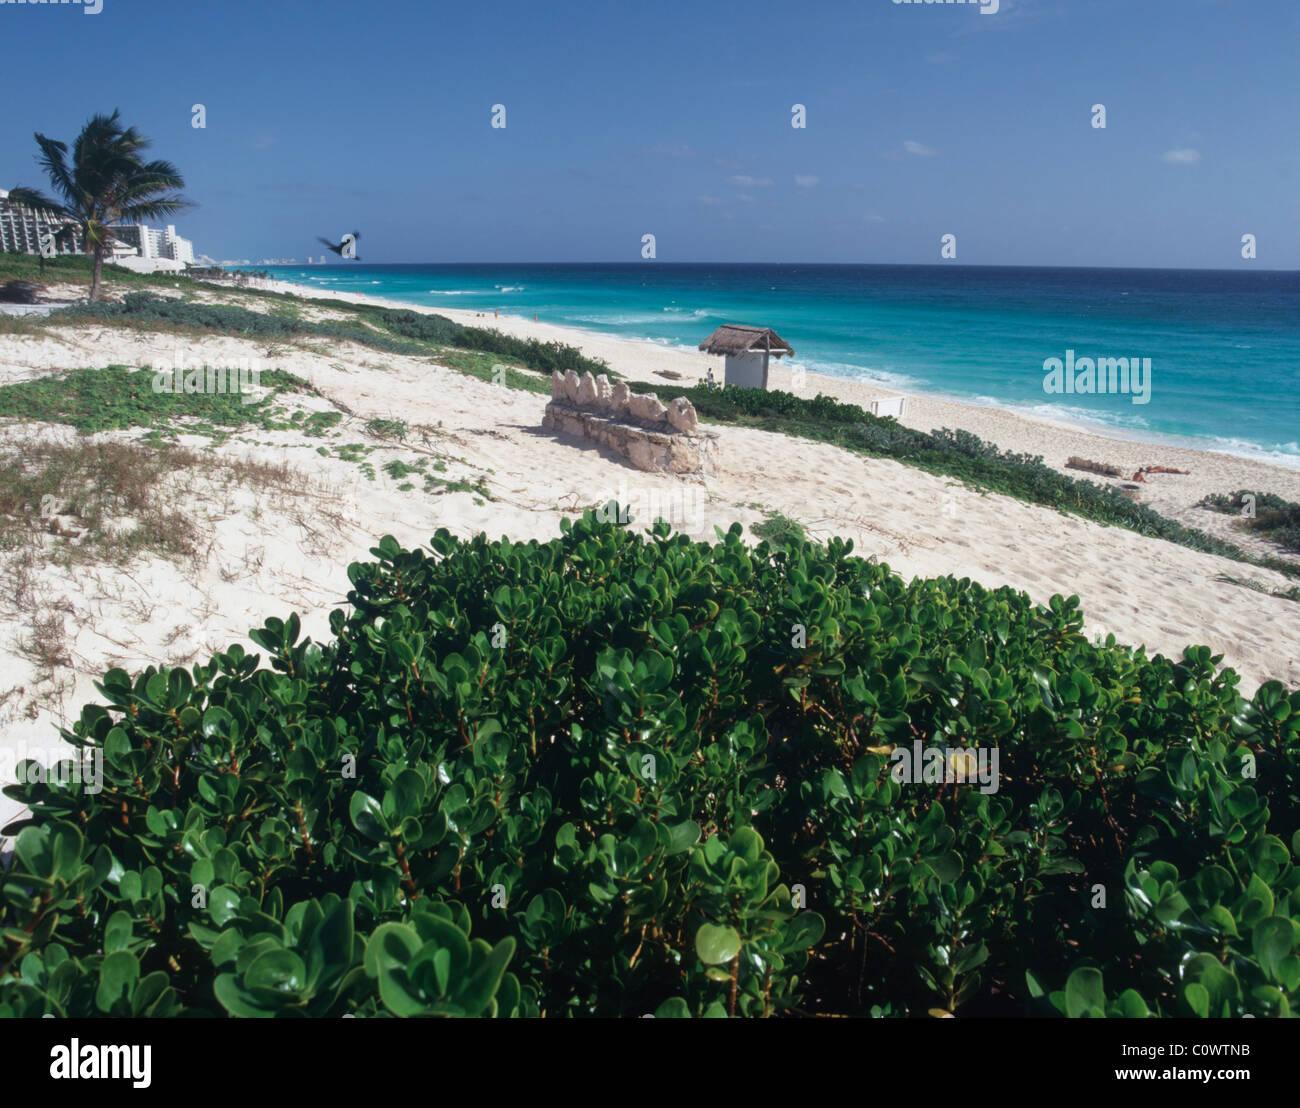 Playa Delfine, Cancun Mexico - Stock Image